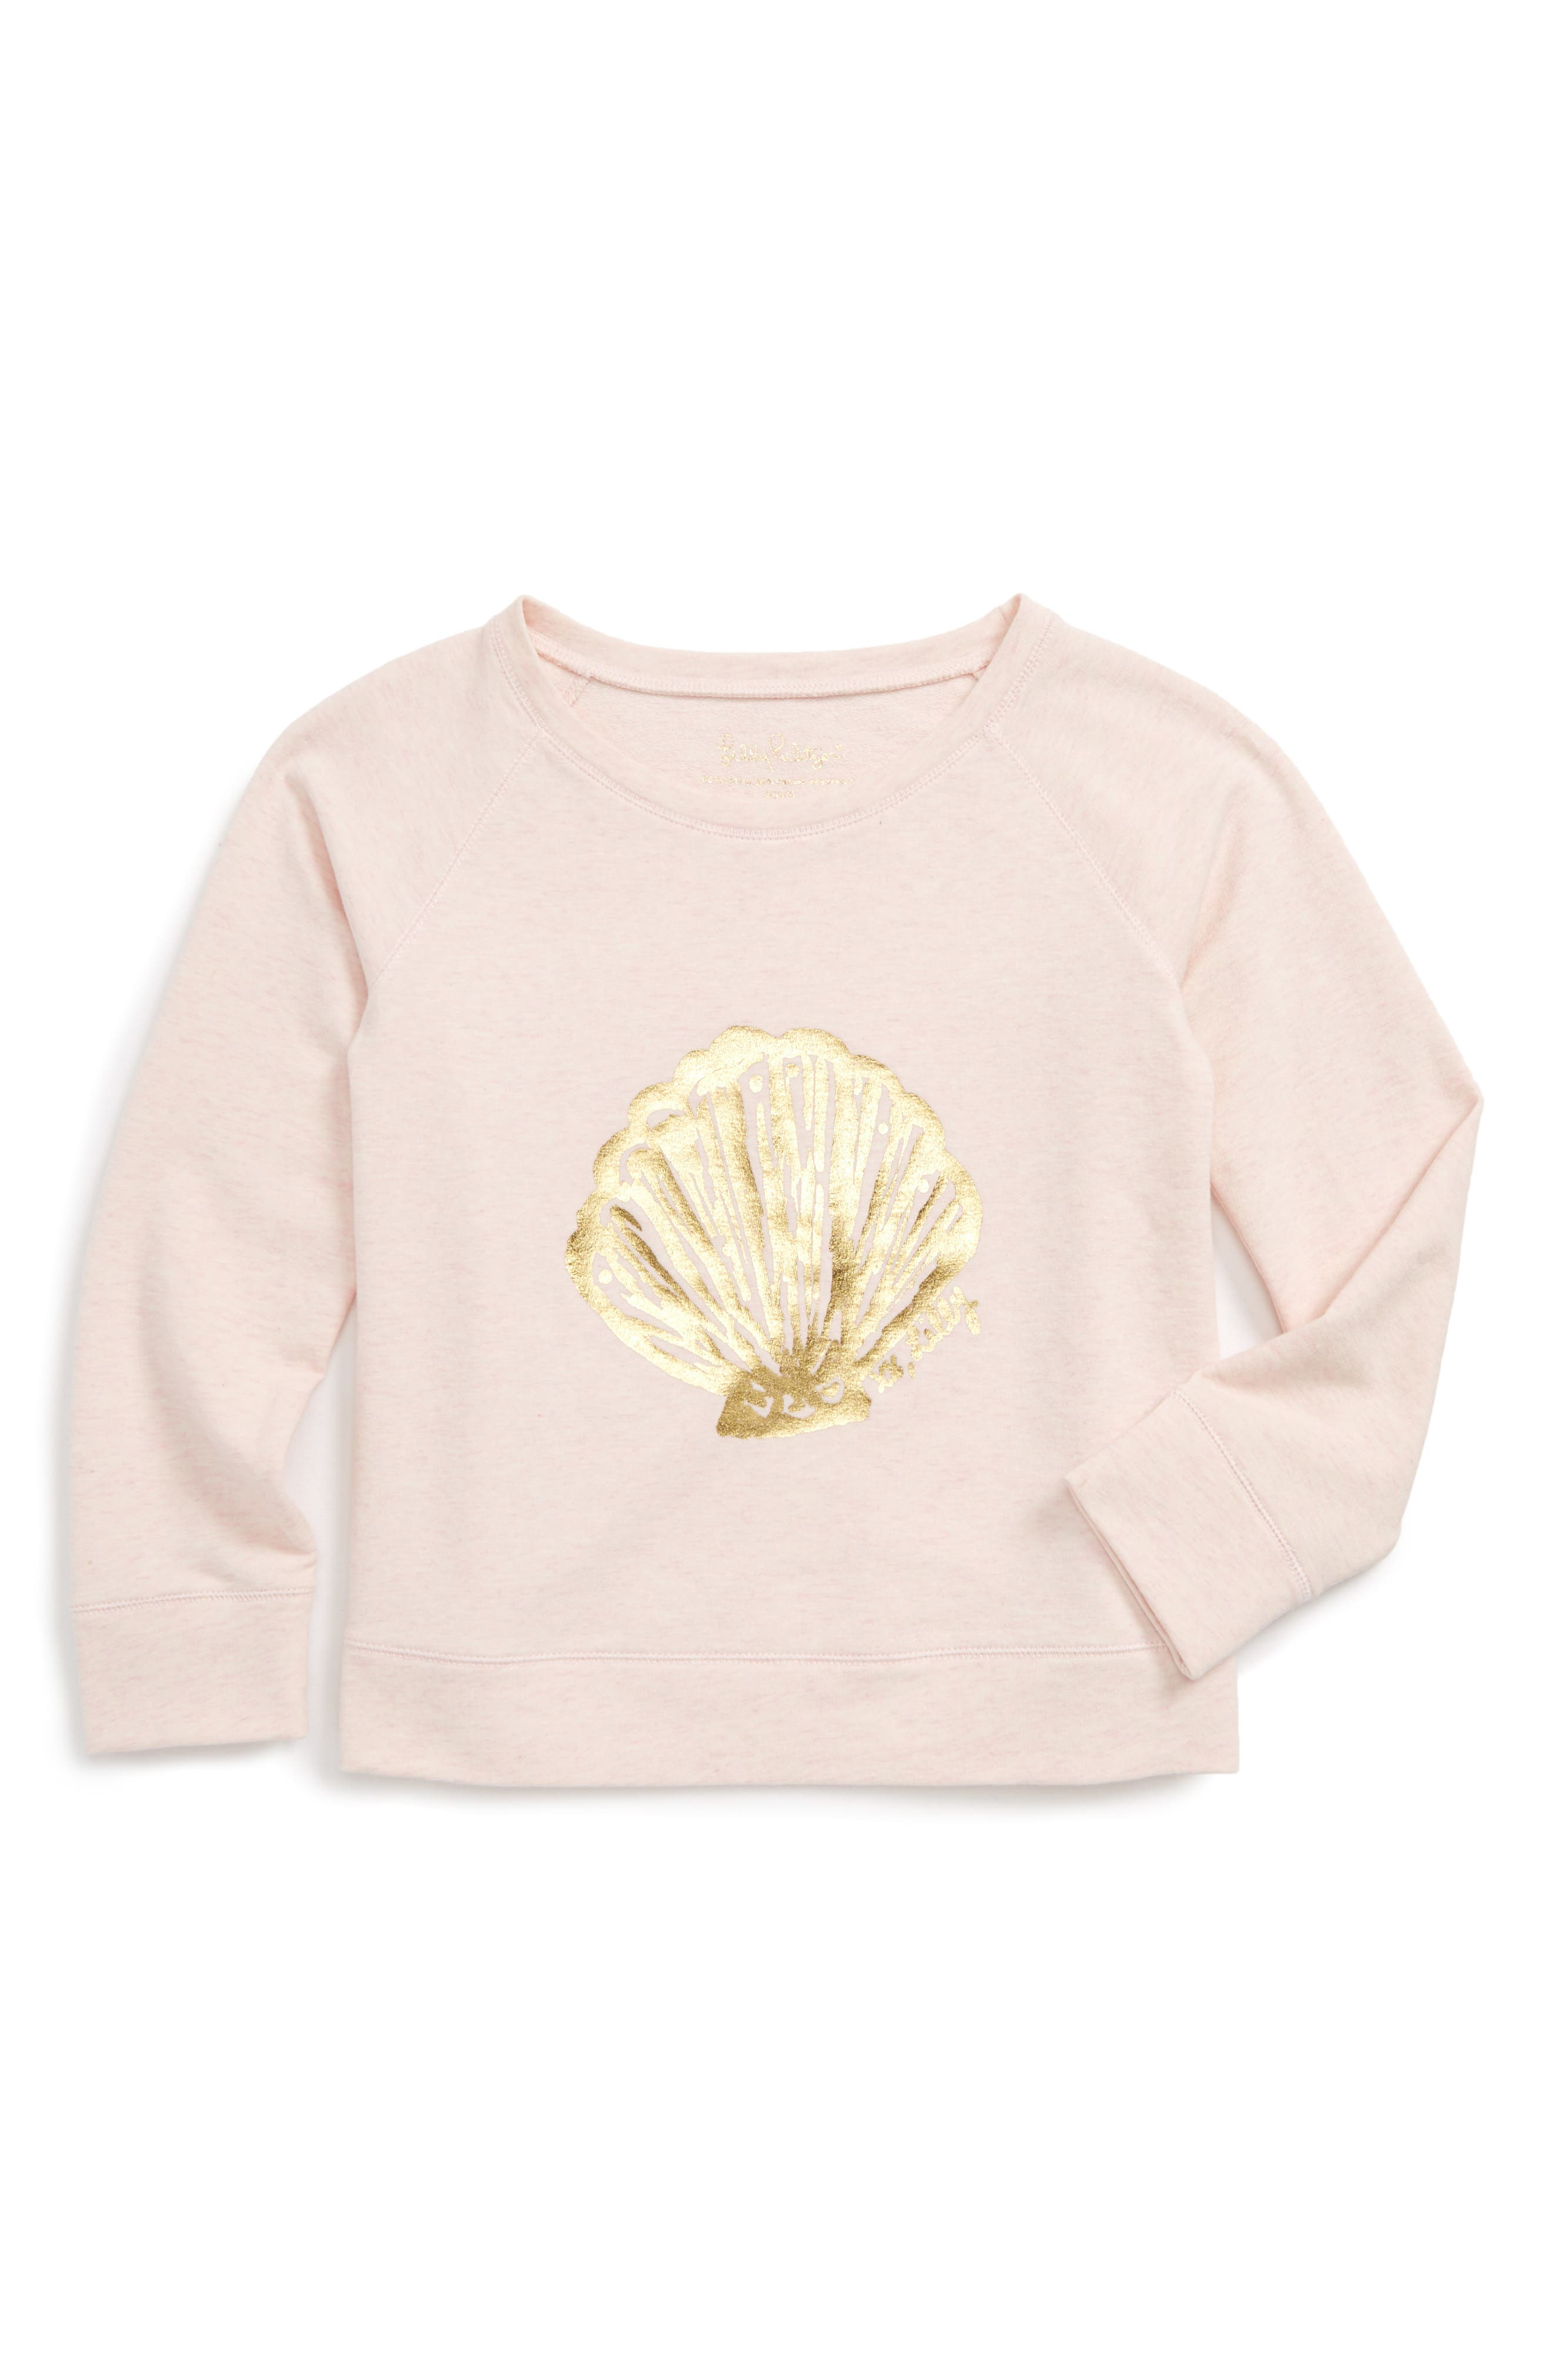 Alternate Image 1 Selected - Lilly Pulitzer Shara Graphic Print Sweatshirt (Toddler Girls, Little Girls & Big Girls)